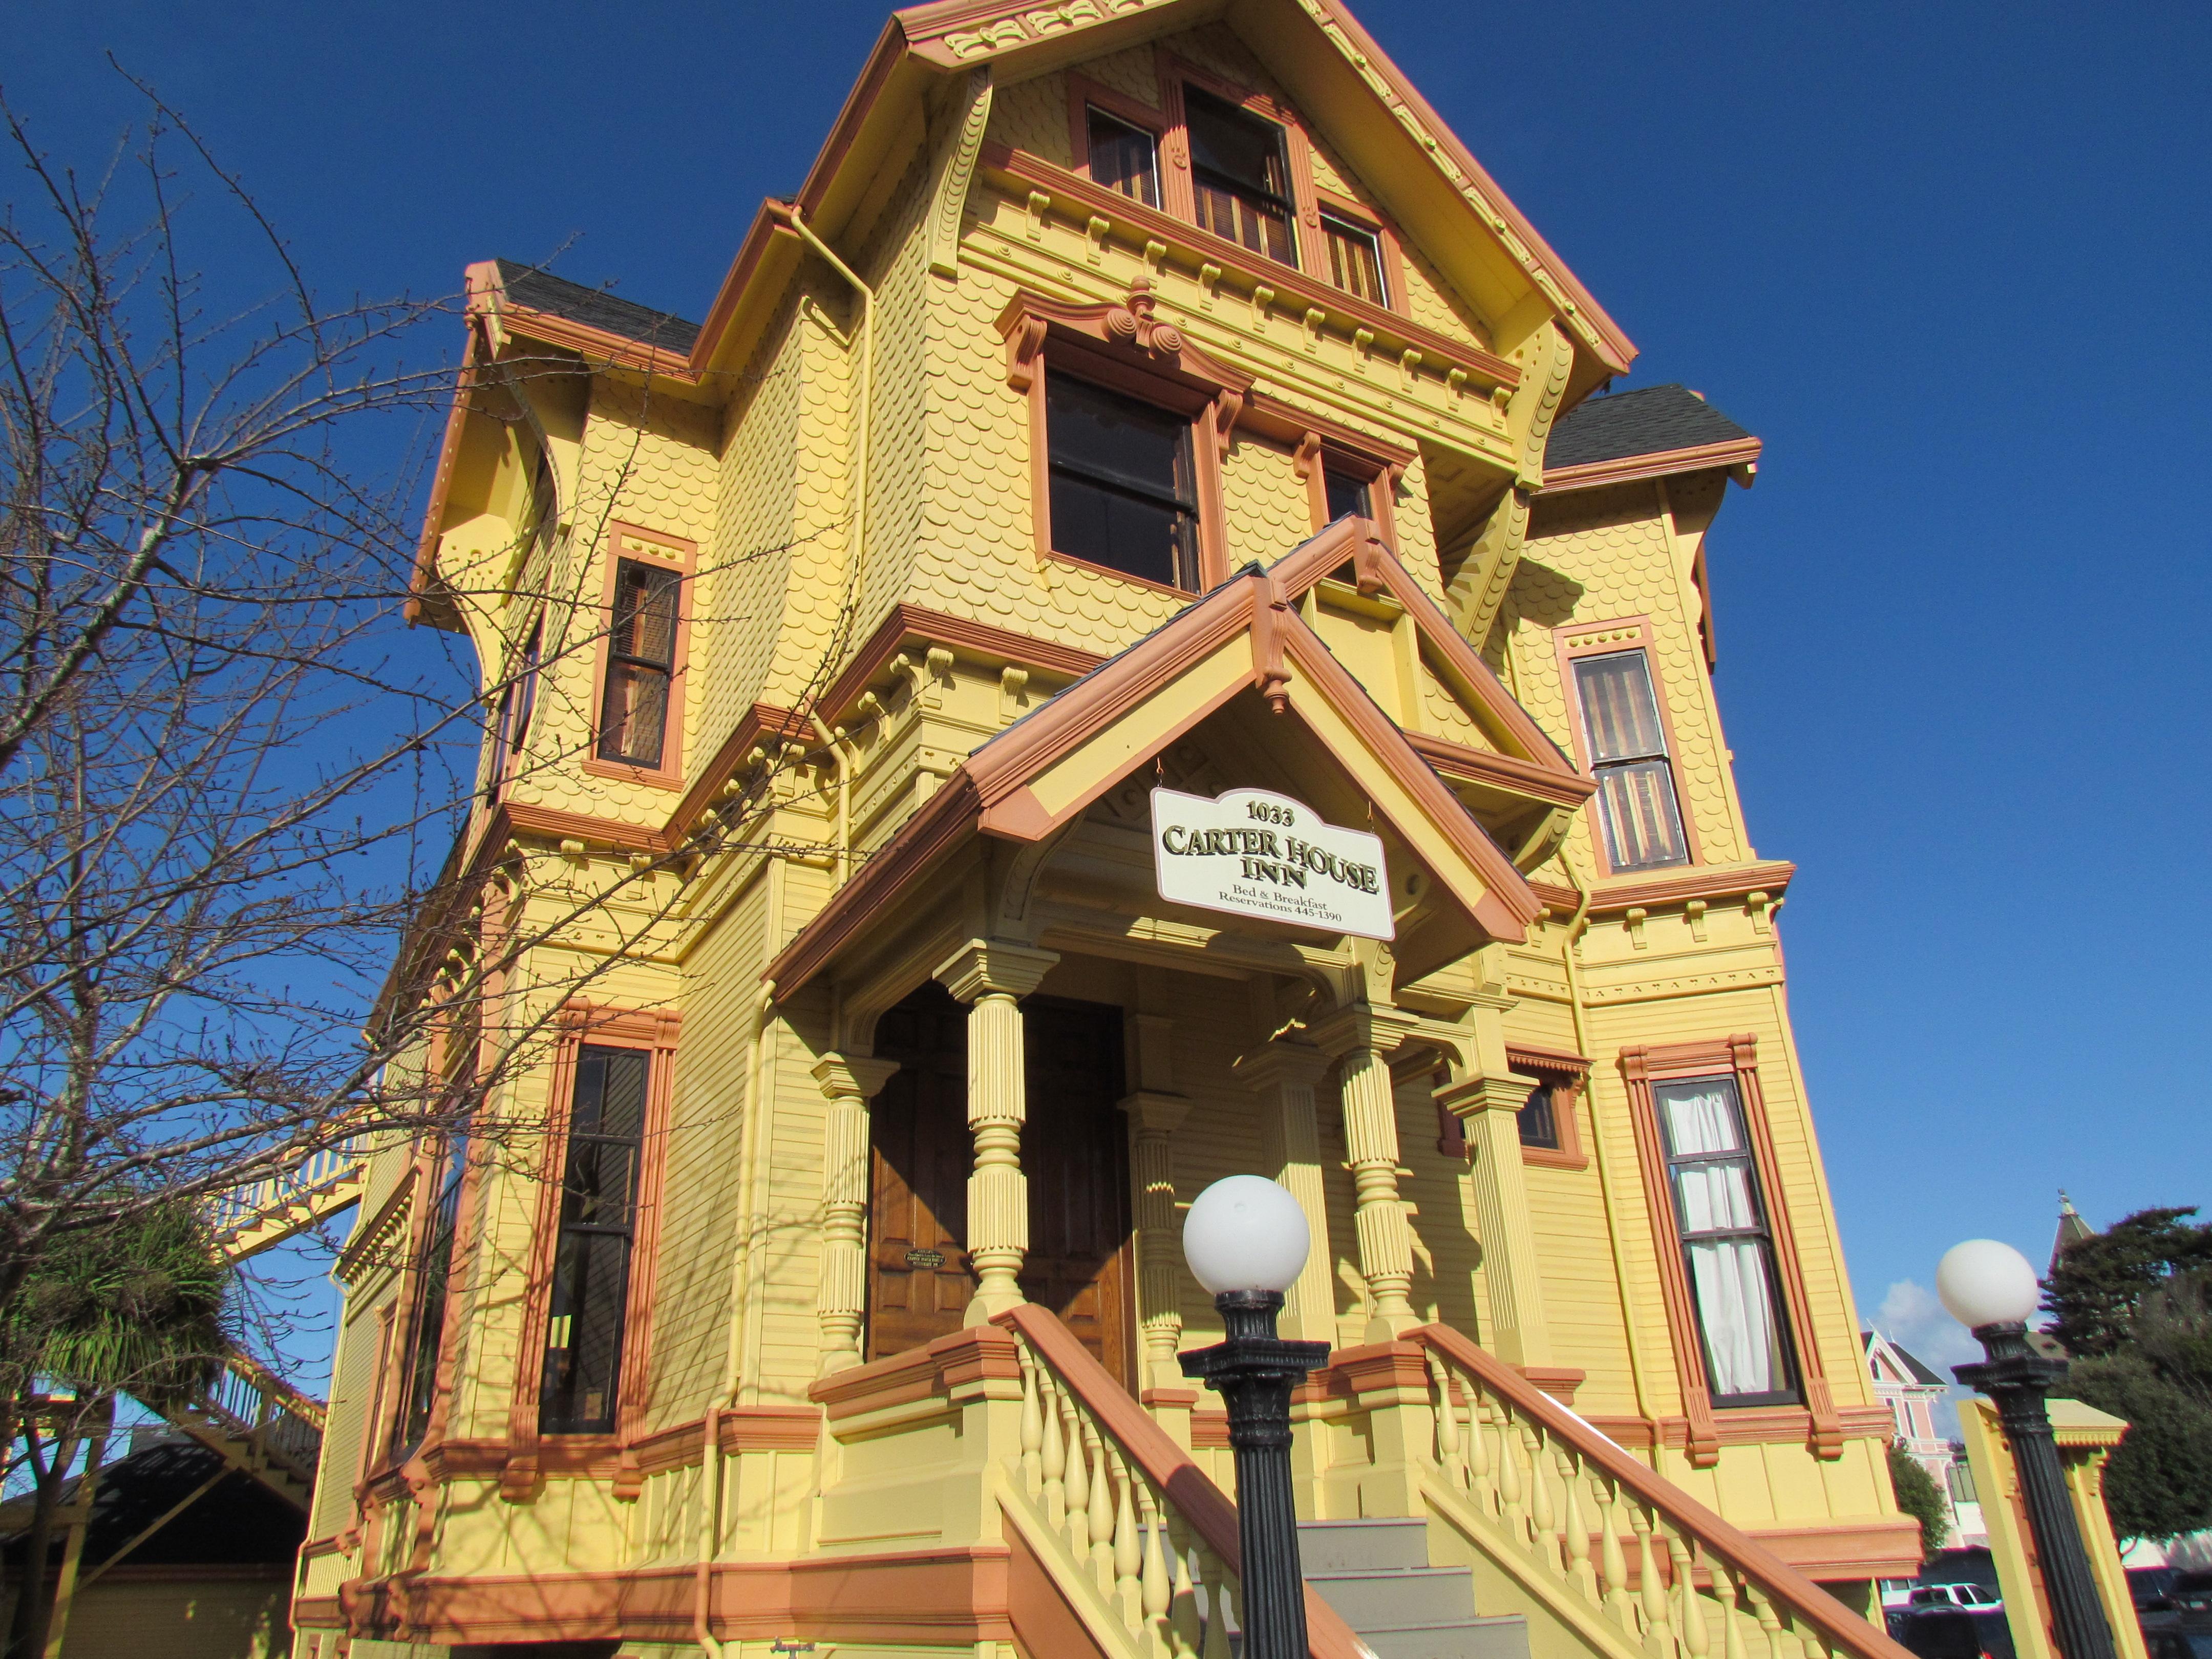 Carter House Inn Wikipedia